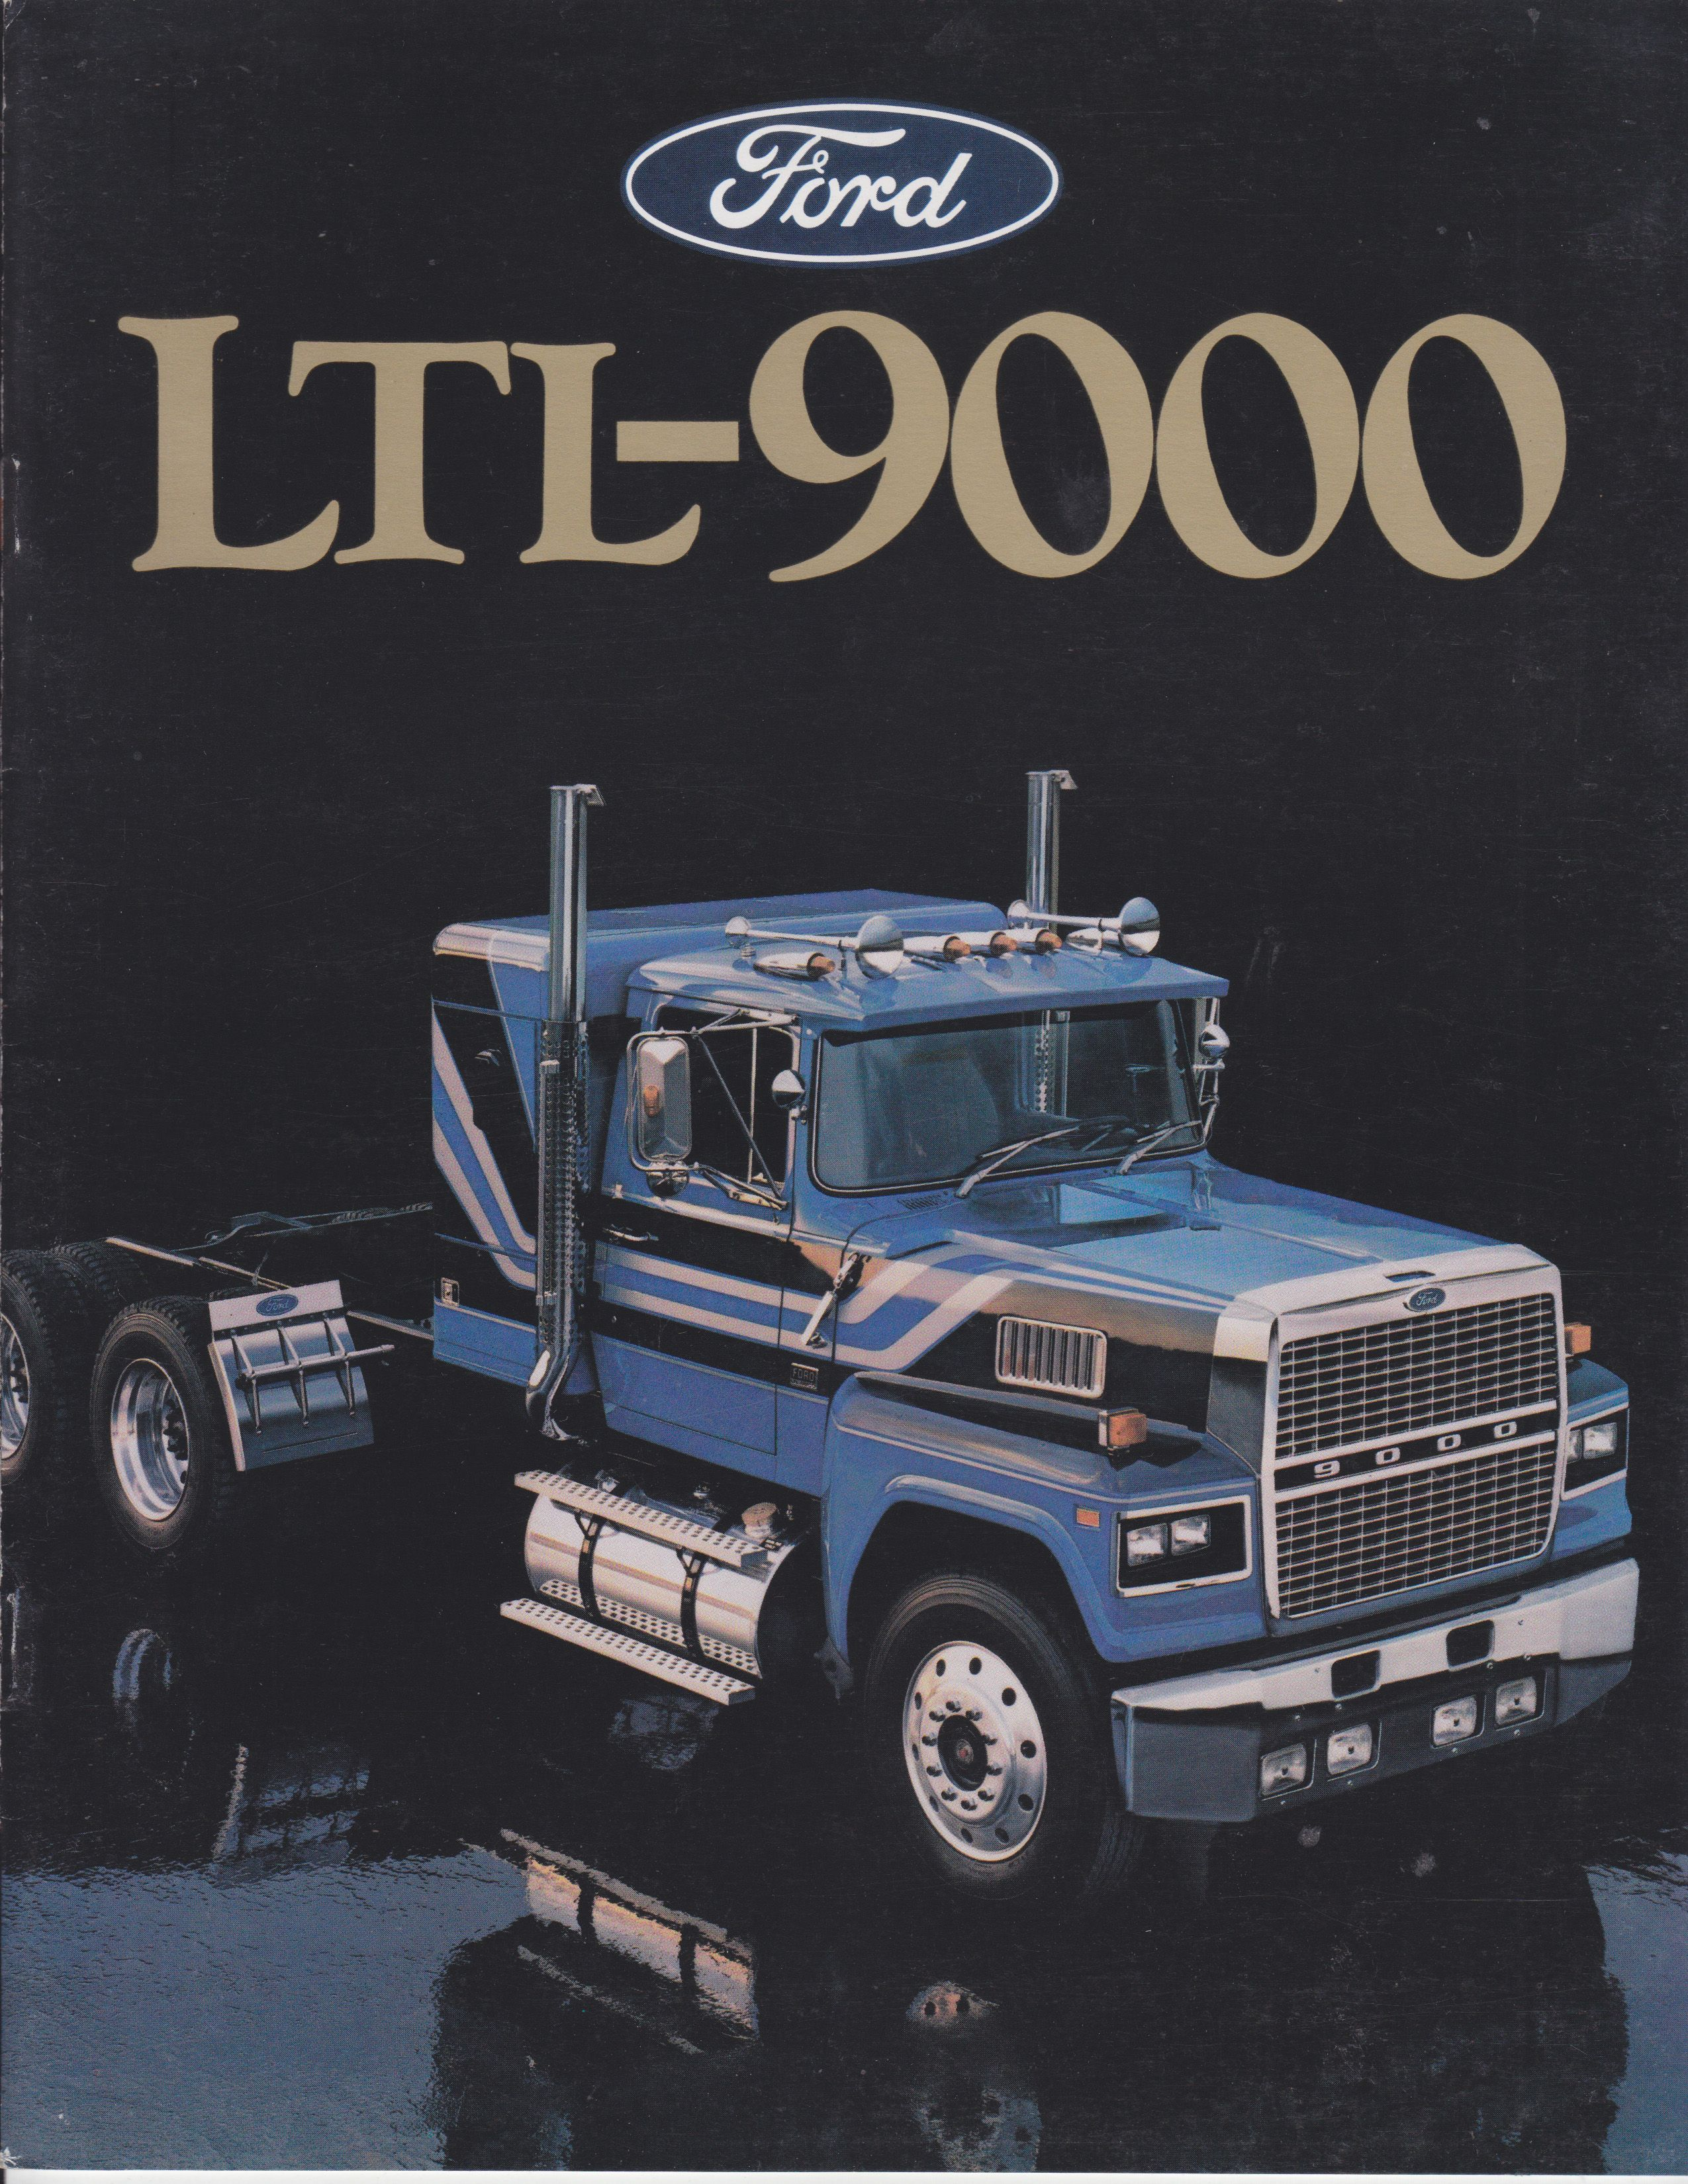 Ford Usa Ltl 9000 Truck Sales Brochure 8 1985 Fto 8624 In 2020 Big Ford Trucks Trucks Ford Trucks